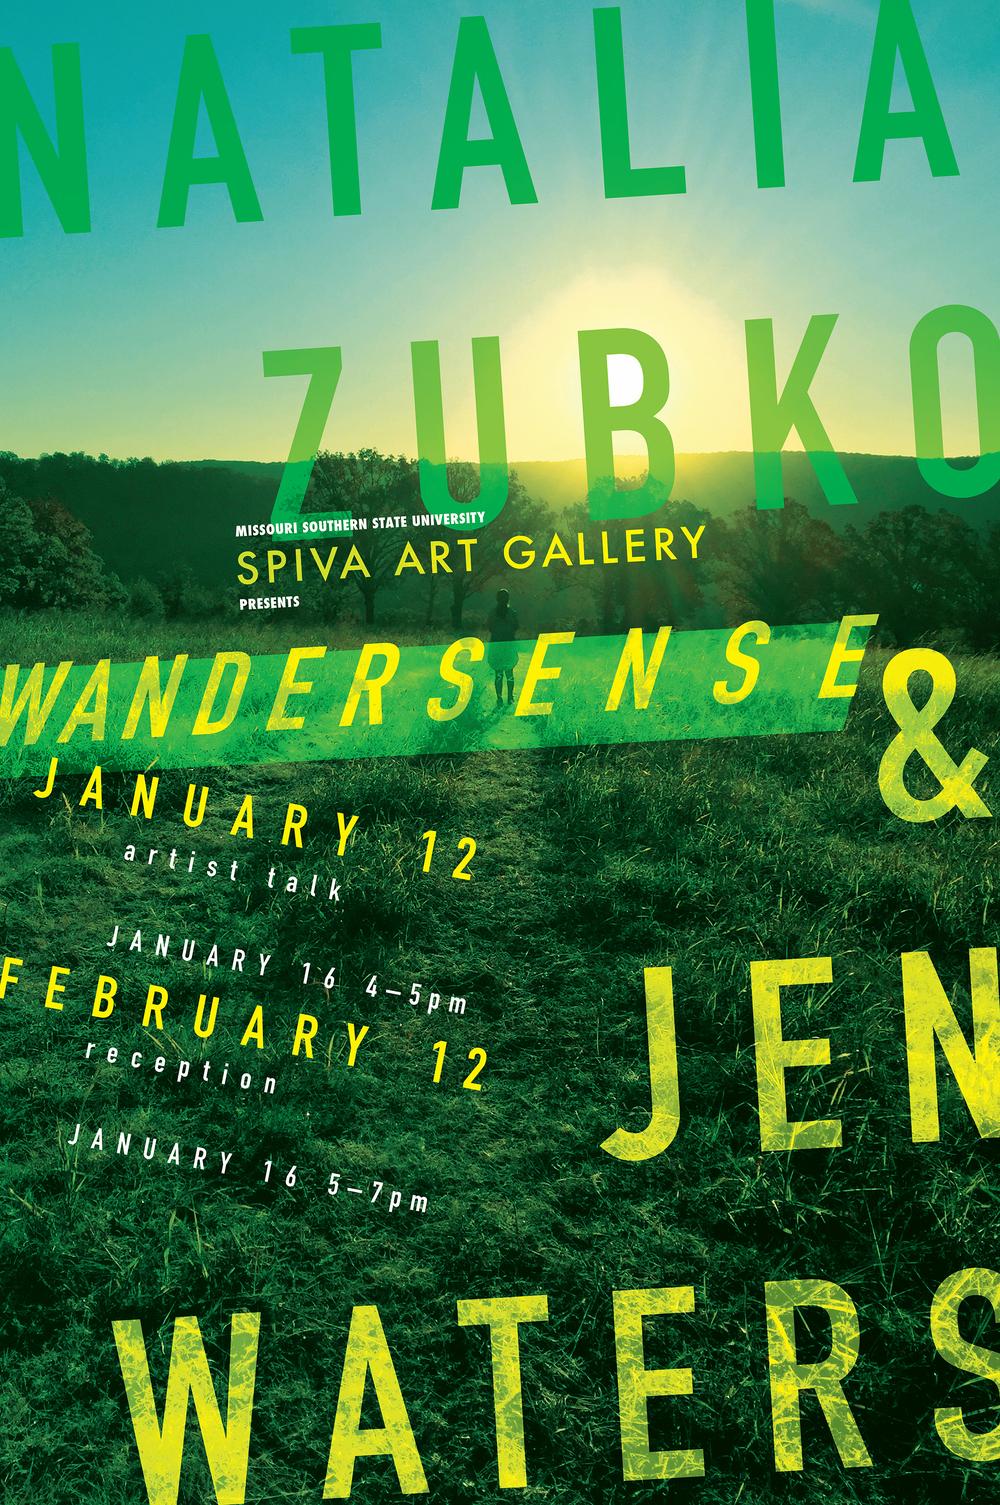 Natalia Zubko & Jen Waters Alternate 24x36